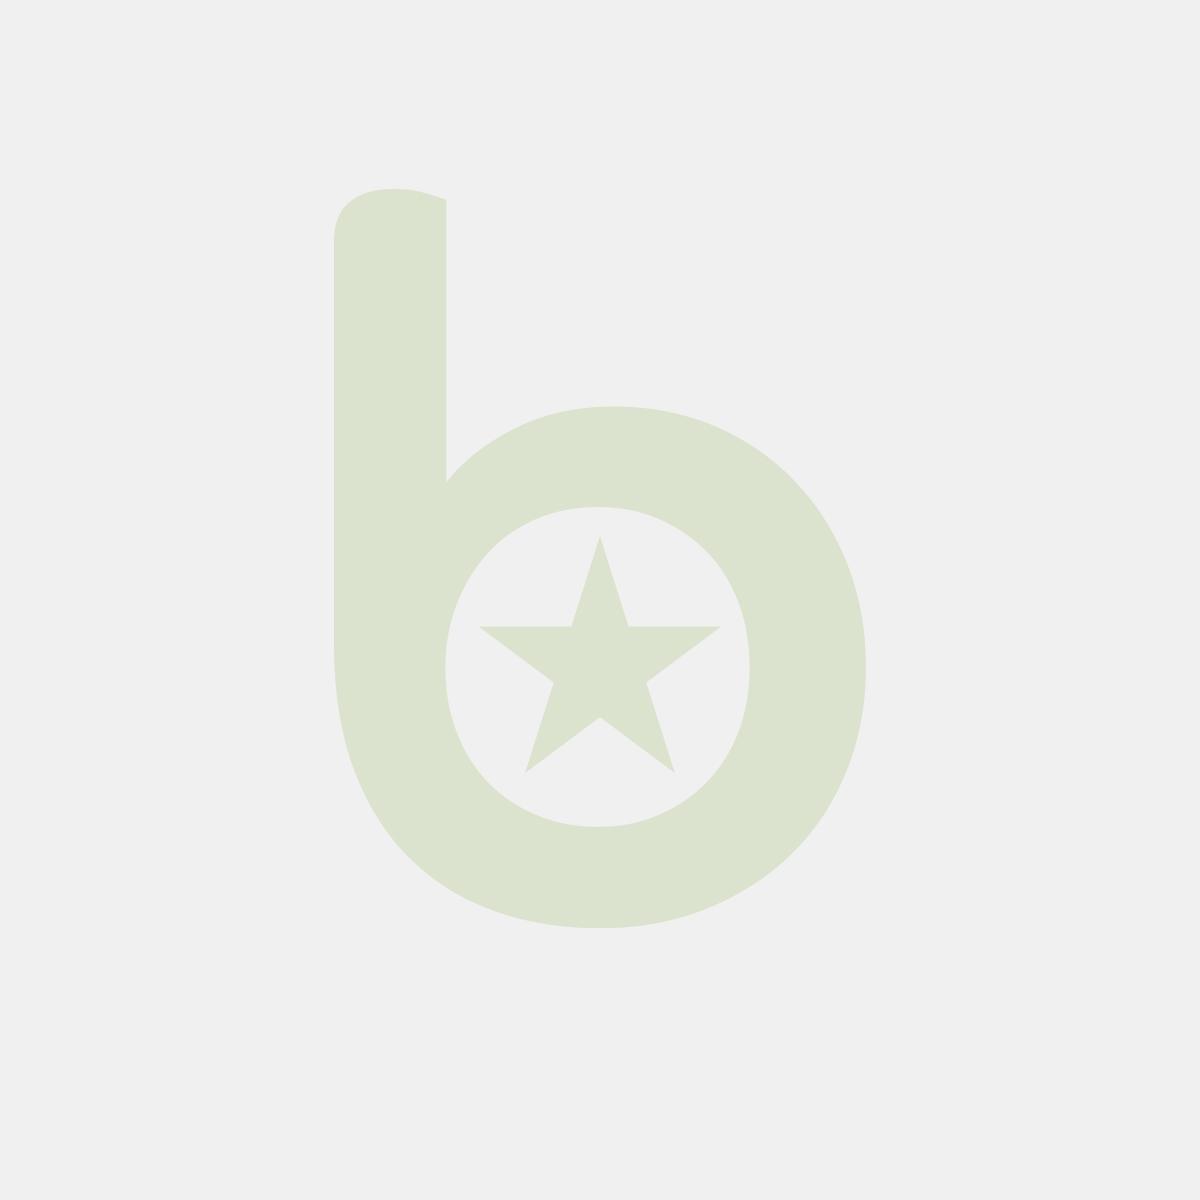 Etui, pochette AIRLAID białe na sztućce op. 100 sztuk